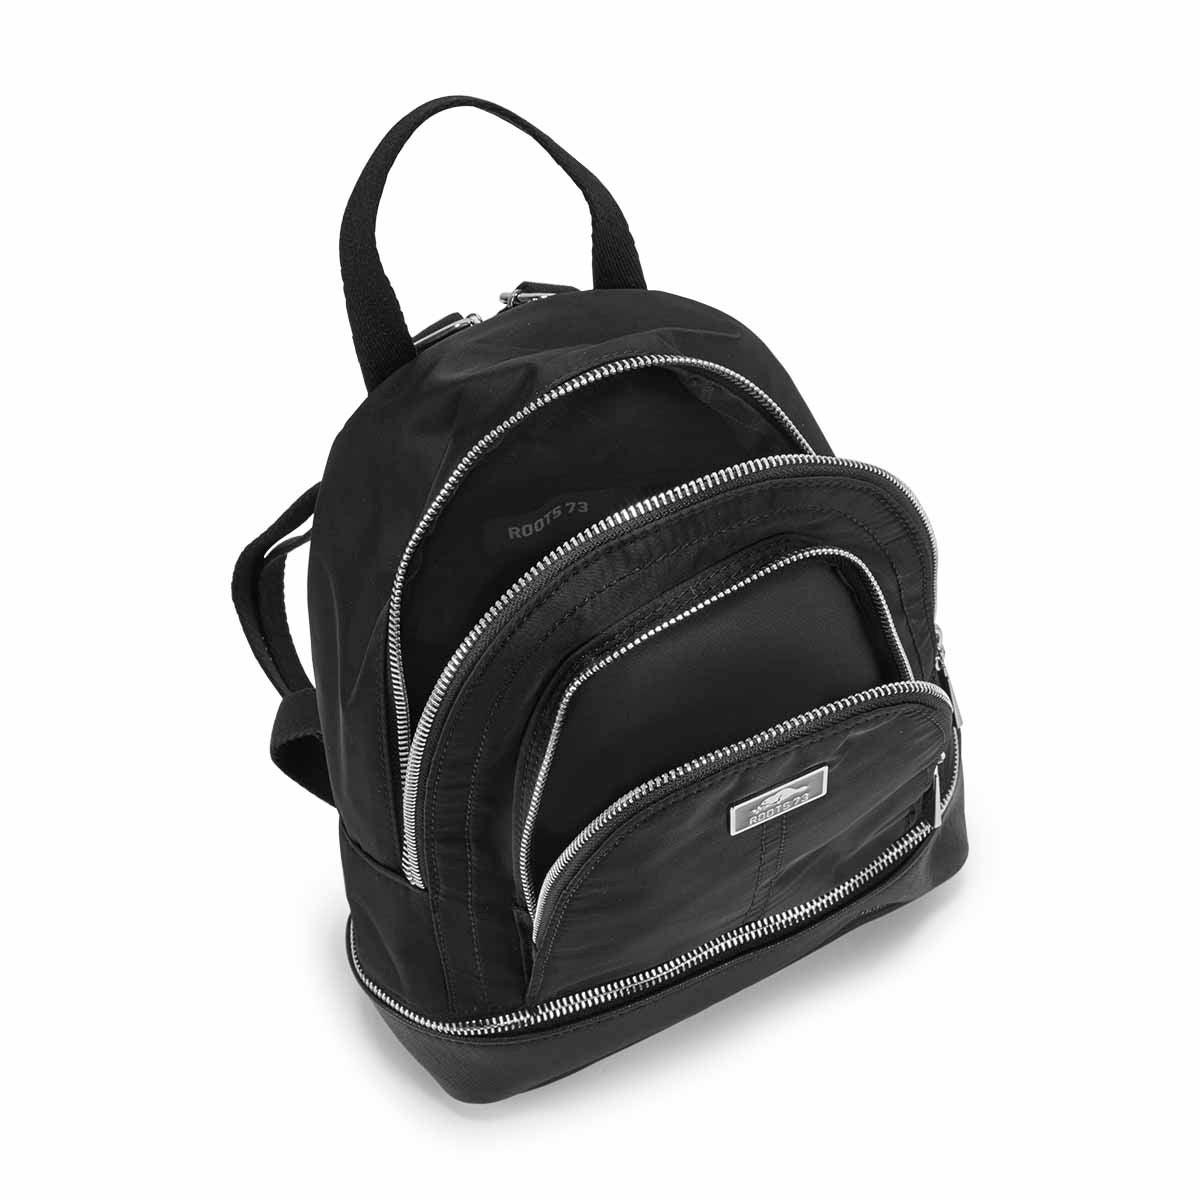 Lds blk zippered bottom mini backpack